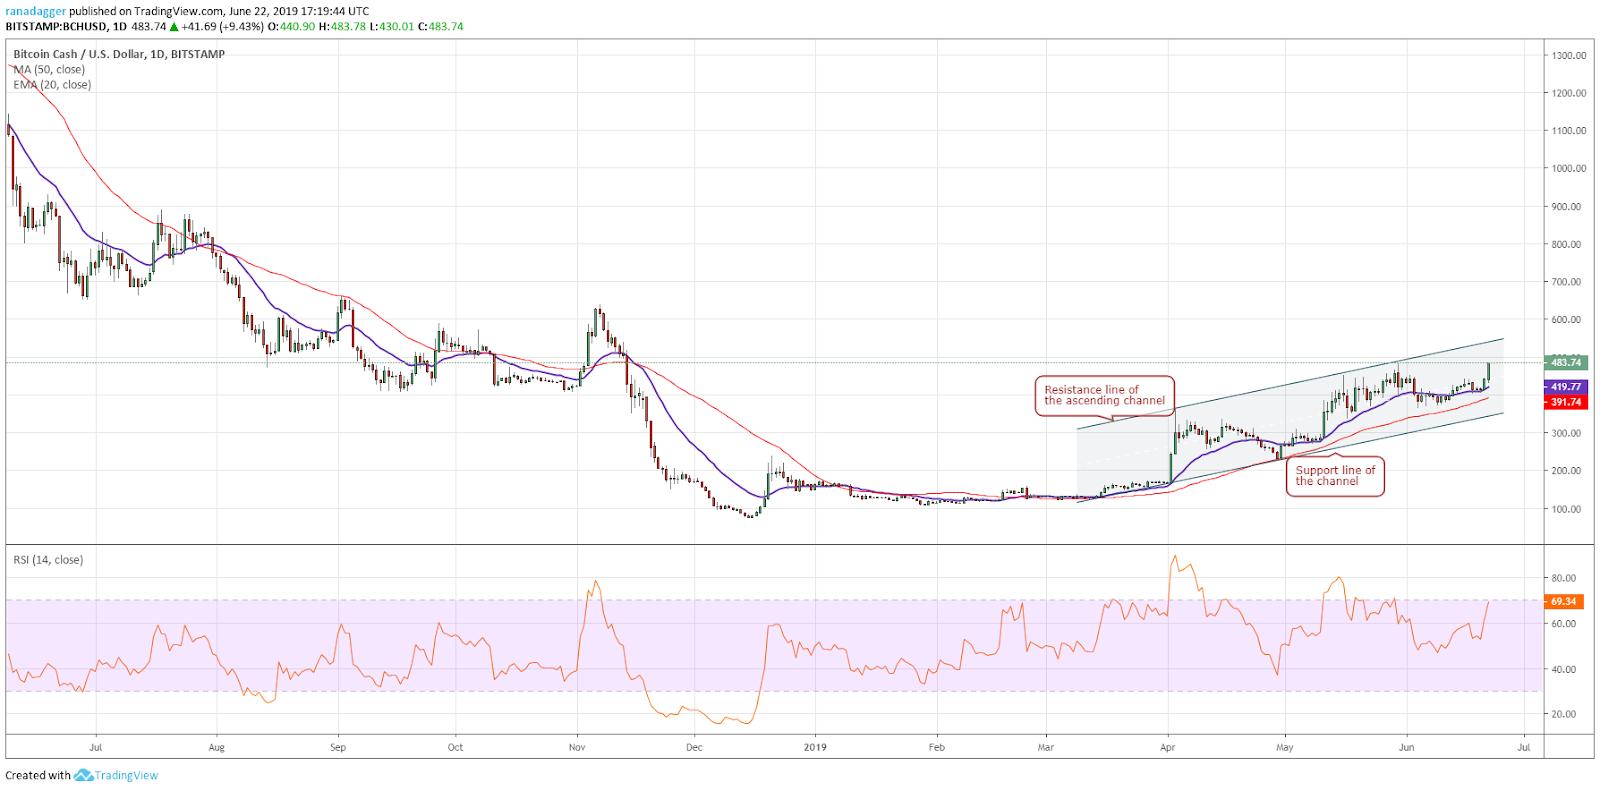 Price Analysis 22/06: BTC, ETH, XRP, LTC, BCH, EOS, BNB, BSV